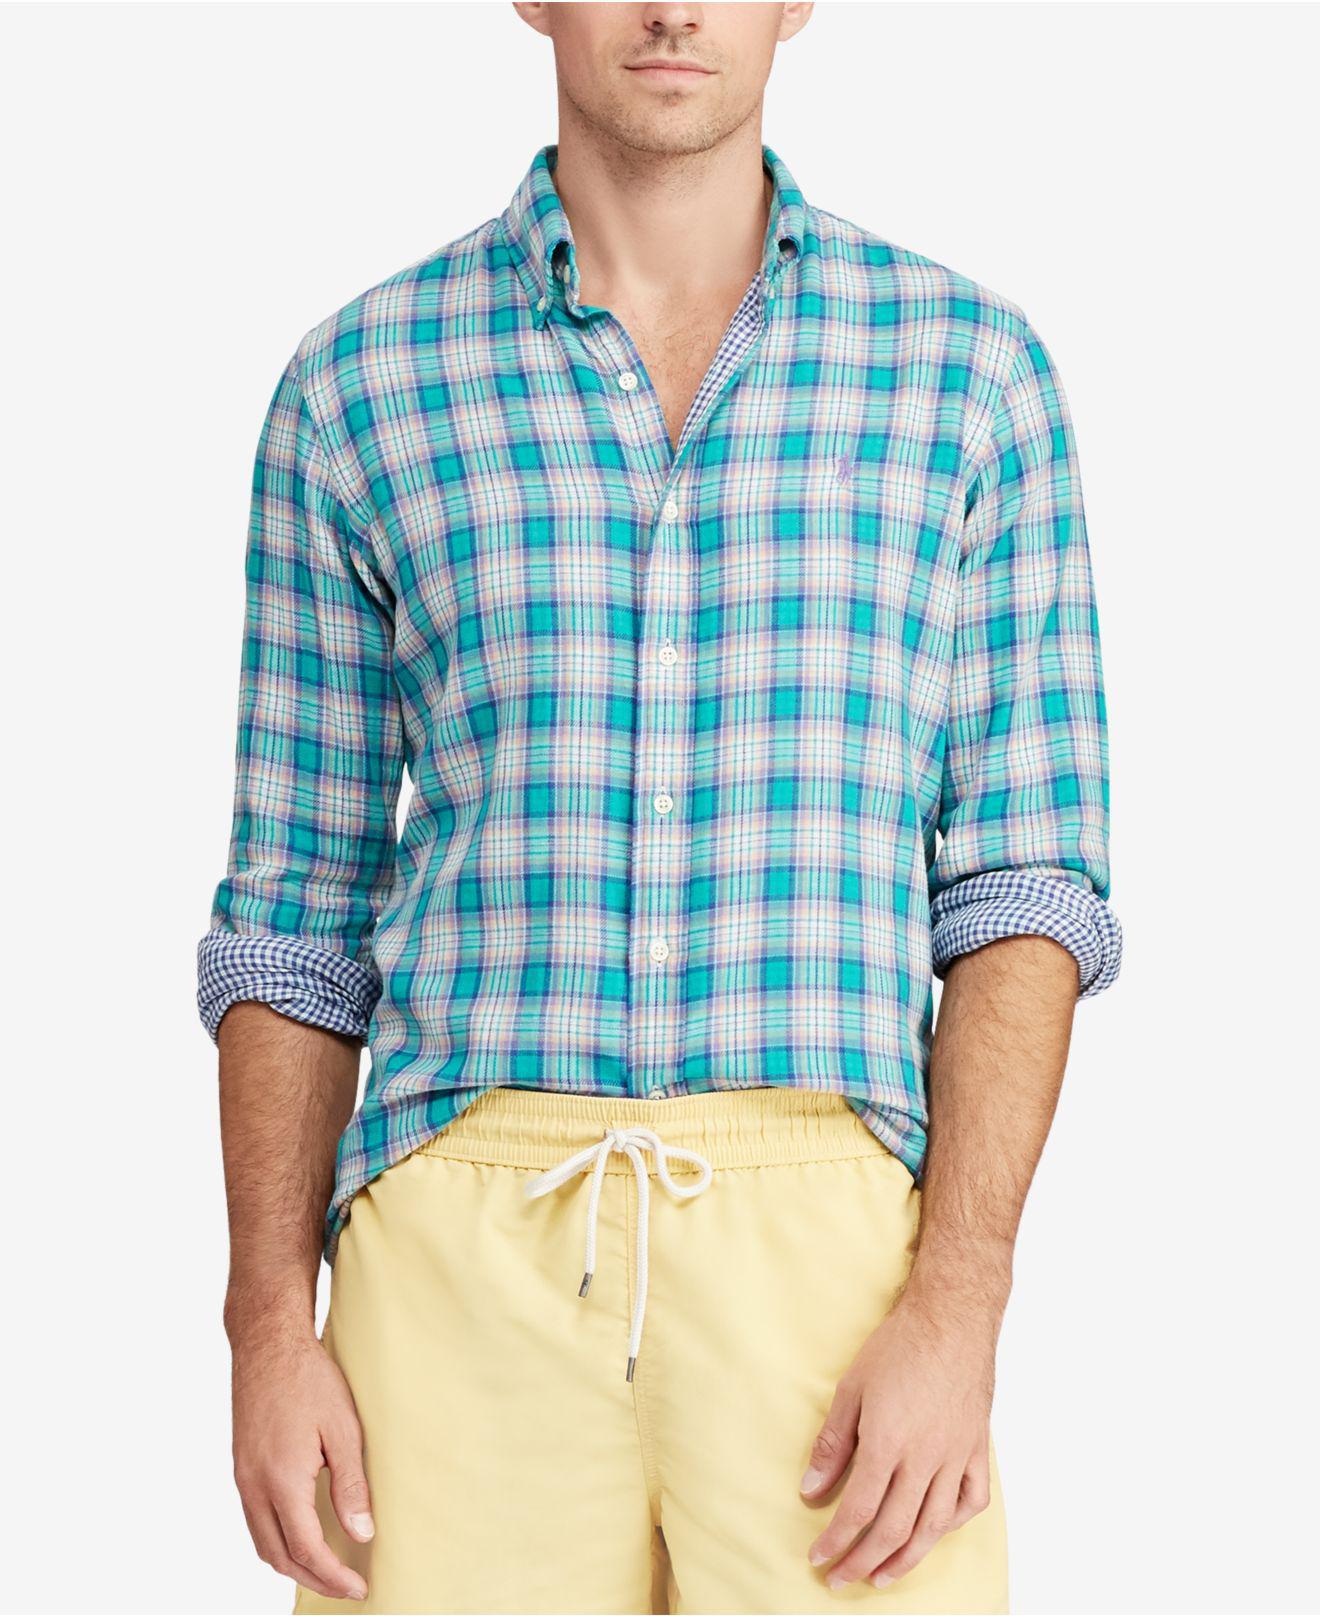 d6a346e284691 ... denmark polo ralph lauren. mens blue classic fit plaid shirt 63587 8f4b7